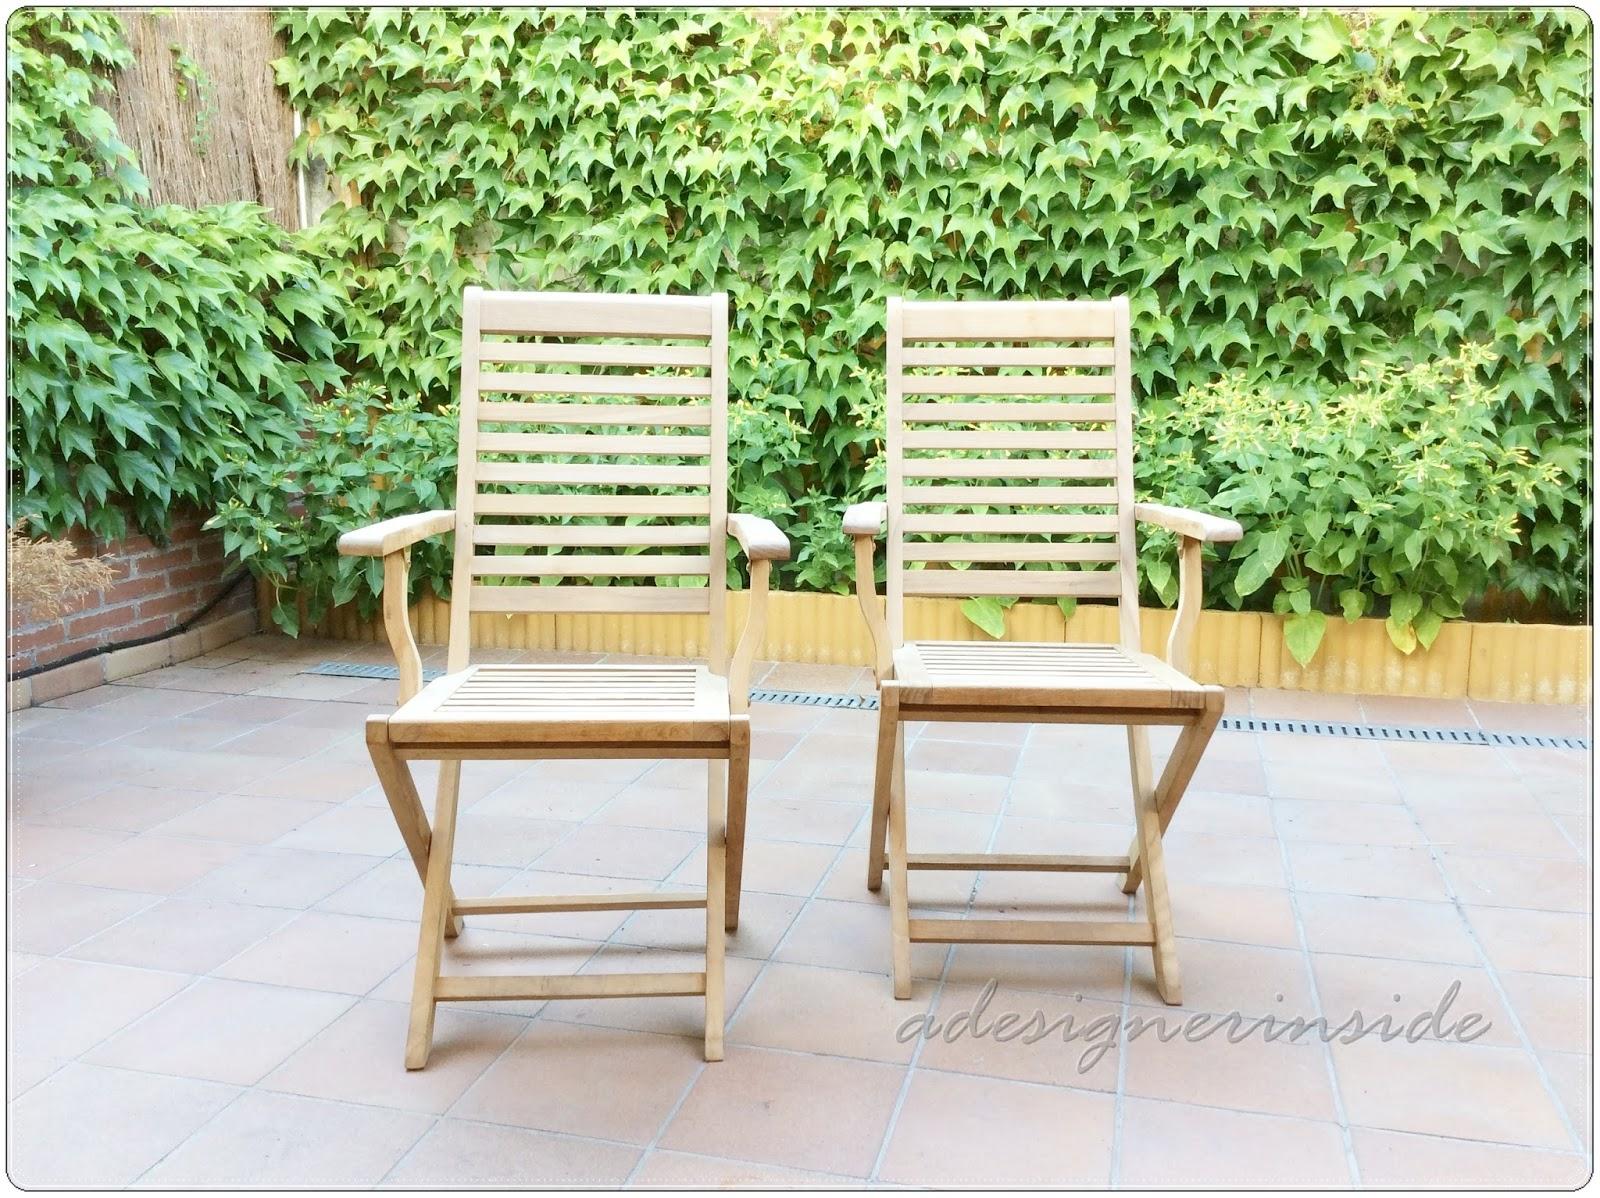 A designer inside como proteger los muebles de exterior for Muebles exterior